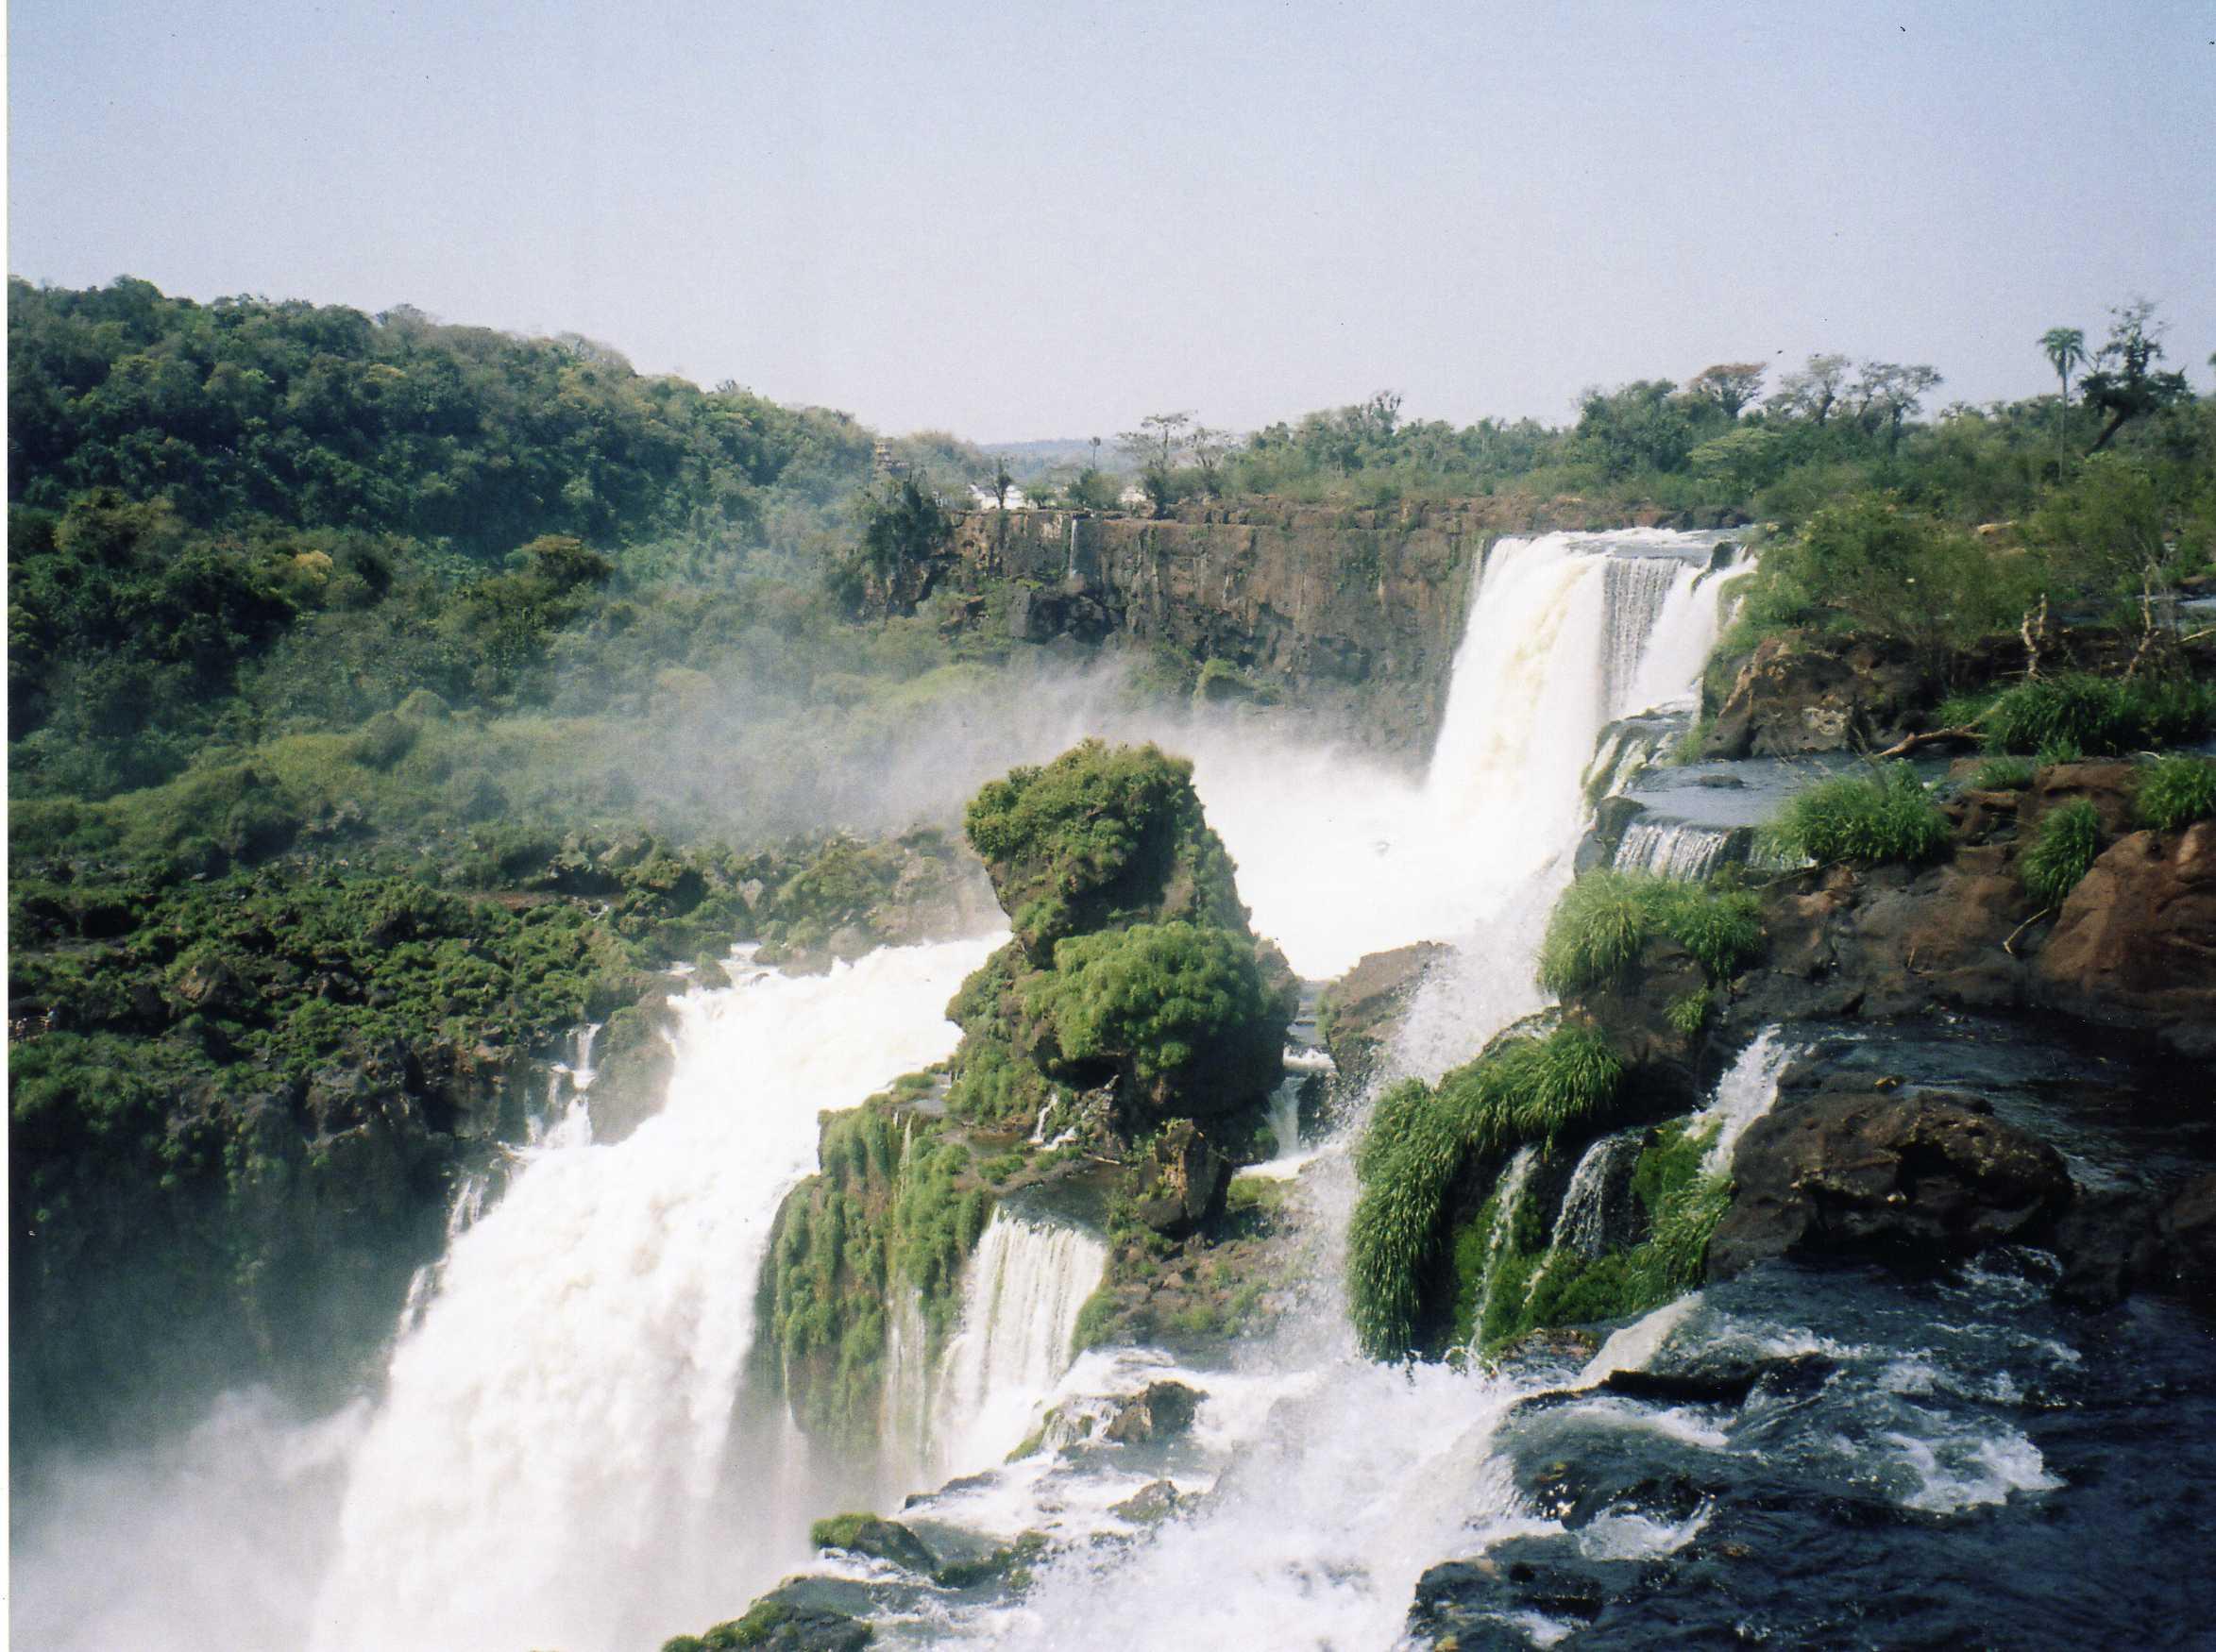 File:Cataratas del Iguazú.jpg - Wikimedia Commons